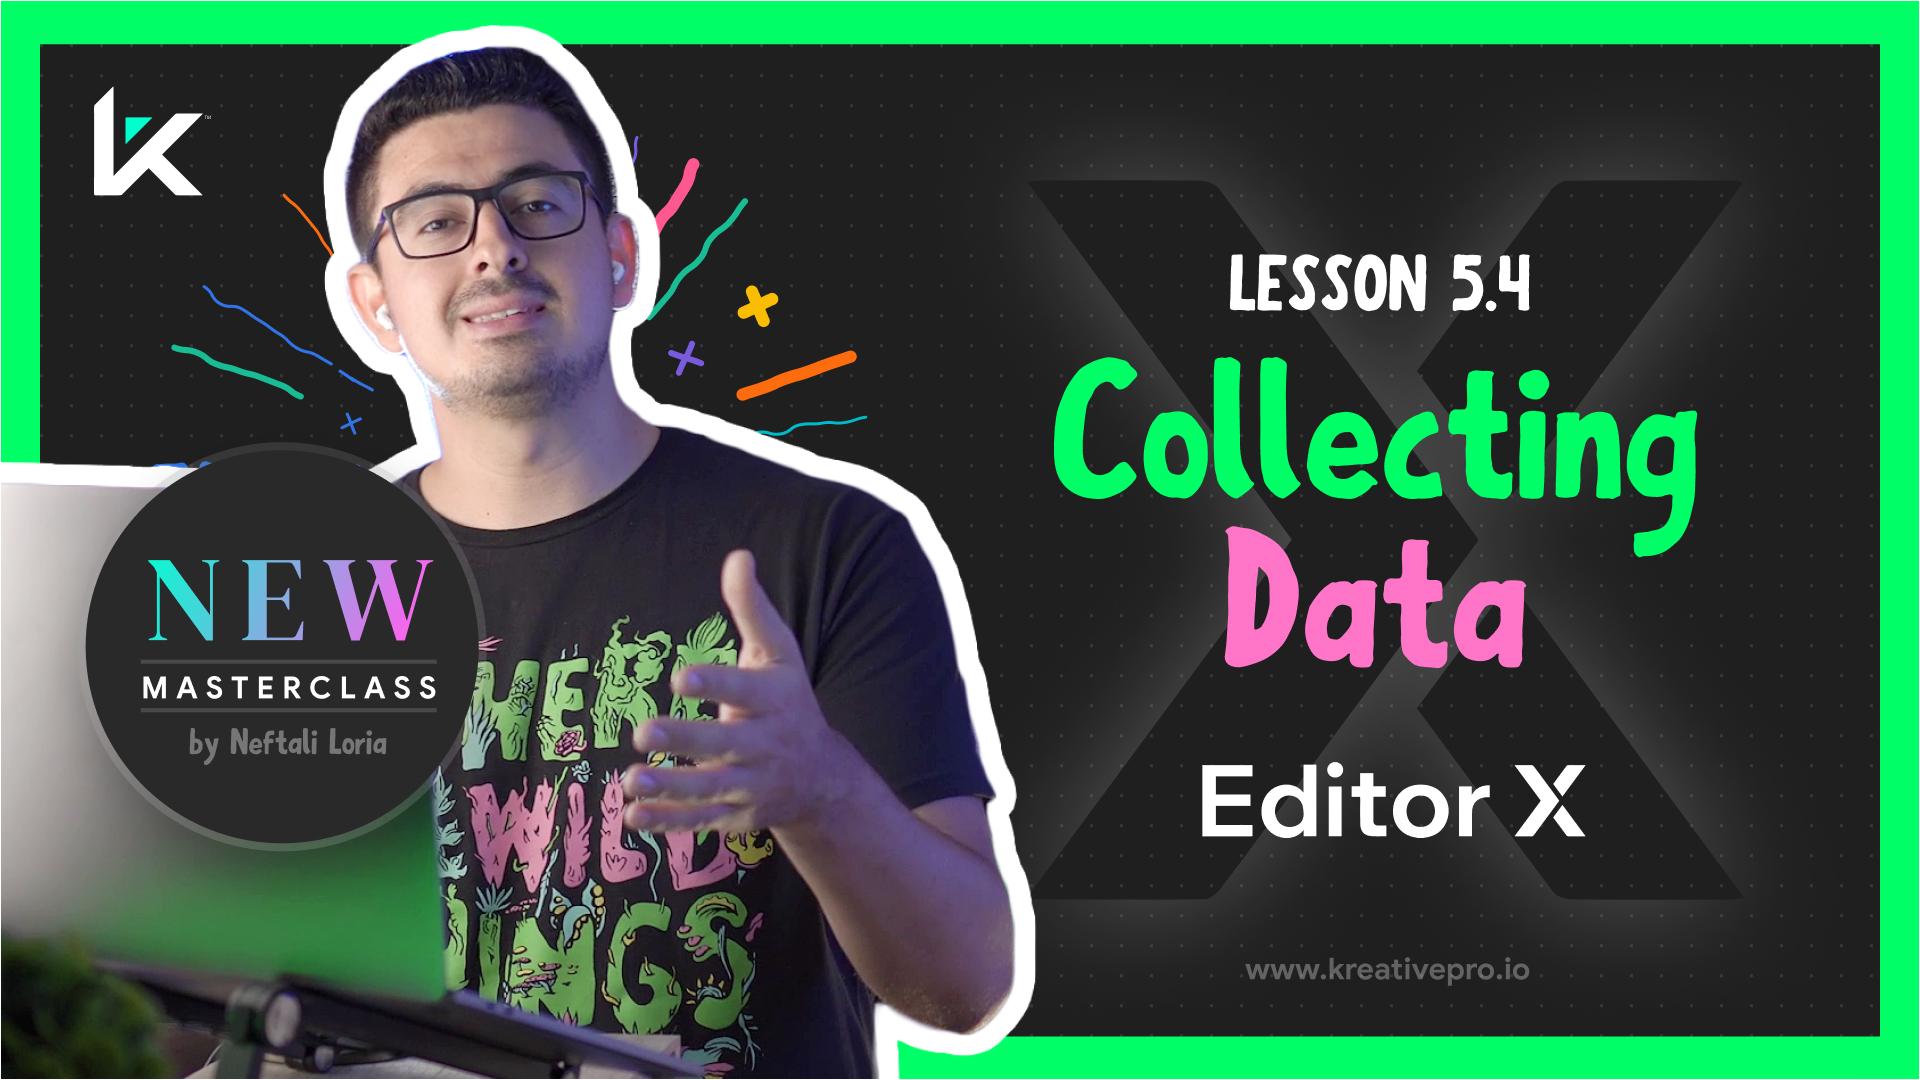 Editor X 5.4 - Collecting Data